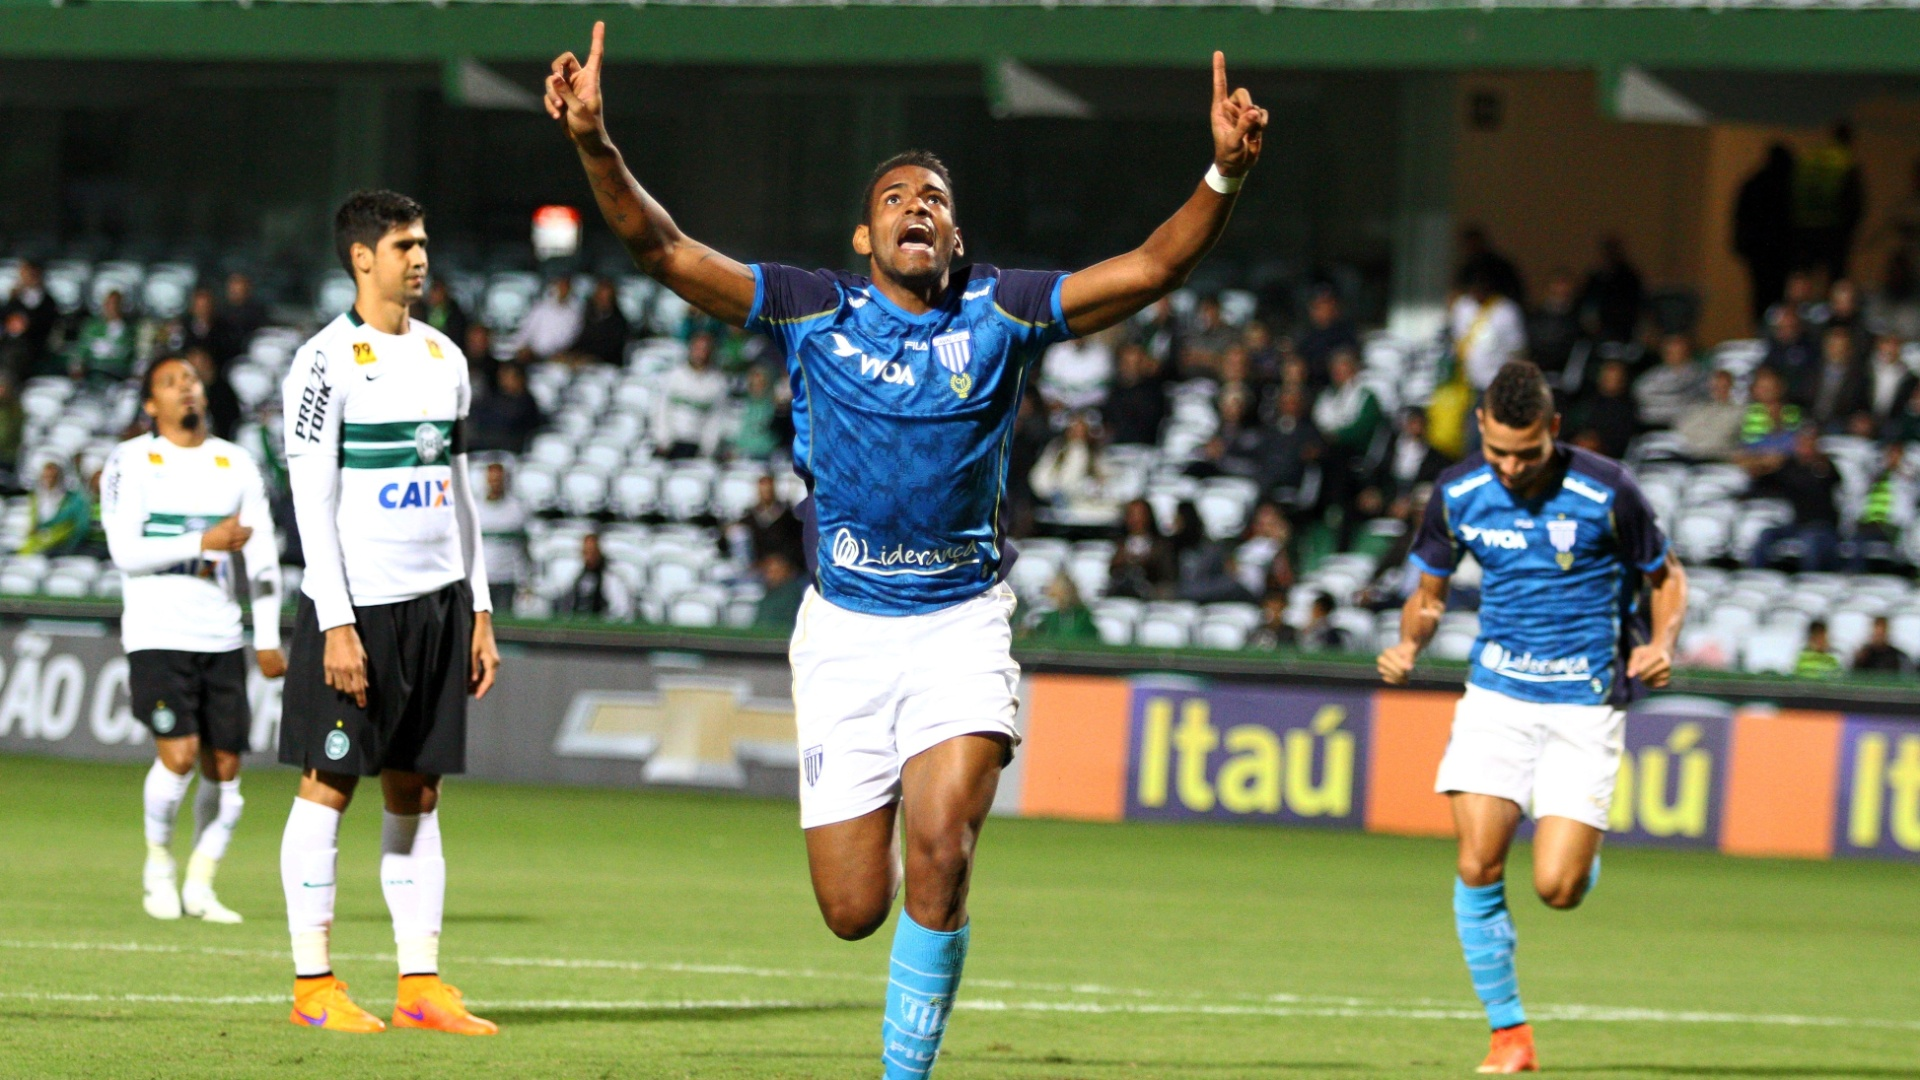 Anderson Lopes, do Avaí, comemora após marcar gol na partida contra o Coritiba, válida pela 4ª rodada do Campeonato Brasileiro, no Estádio Couto Pereira, em Curitiba